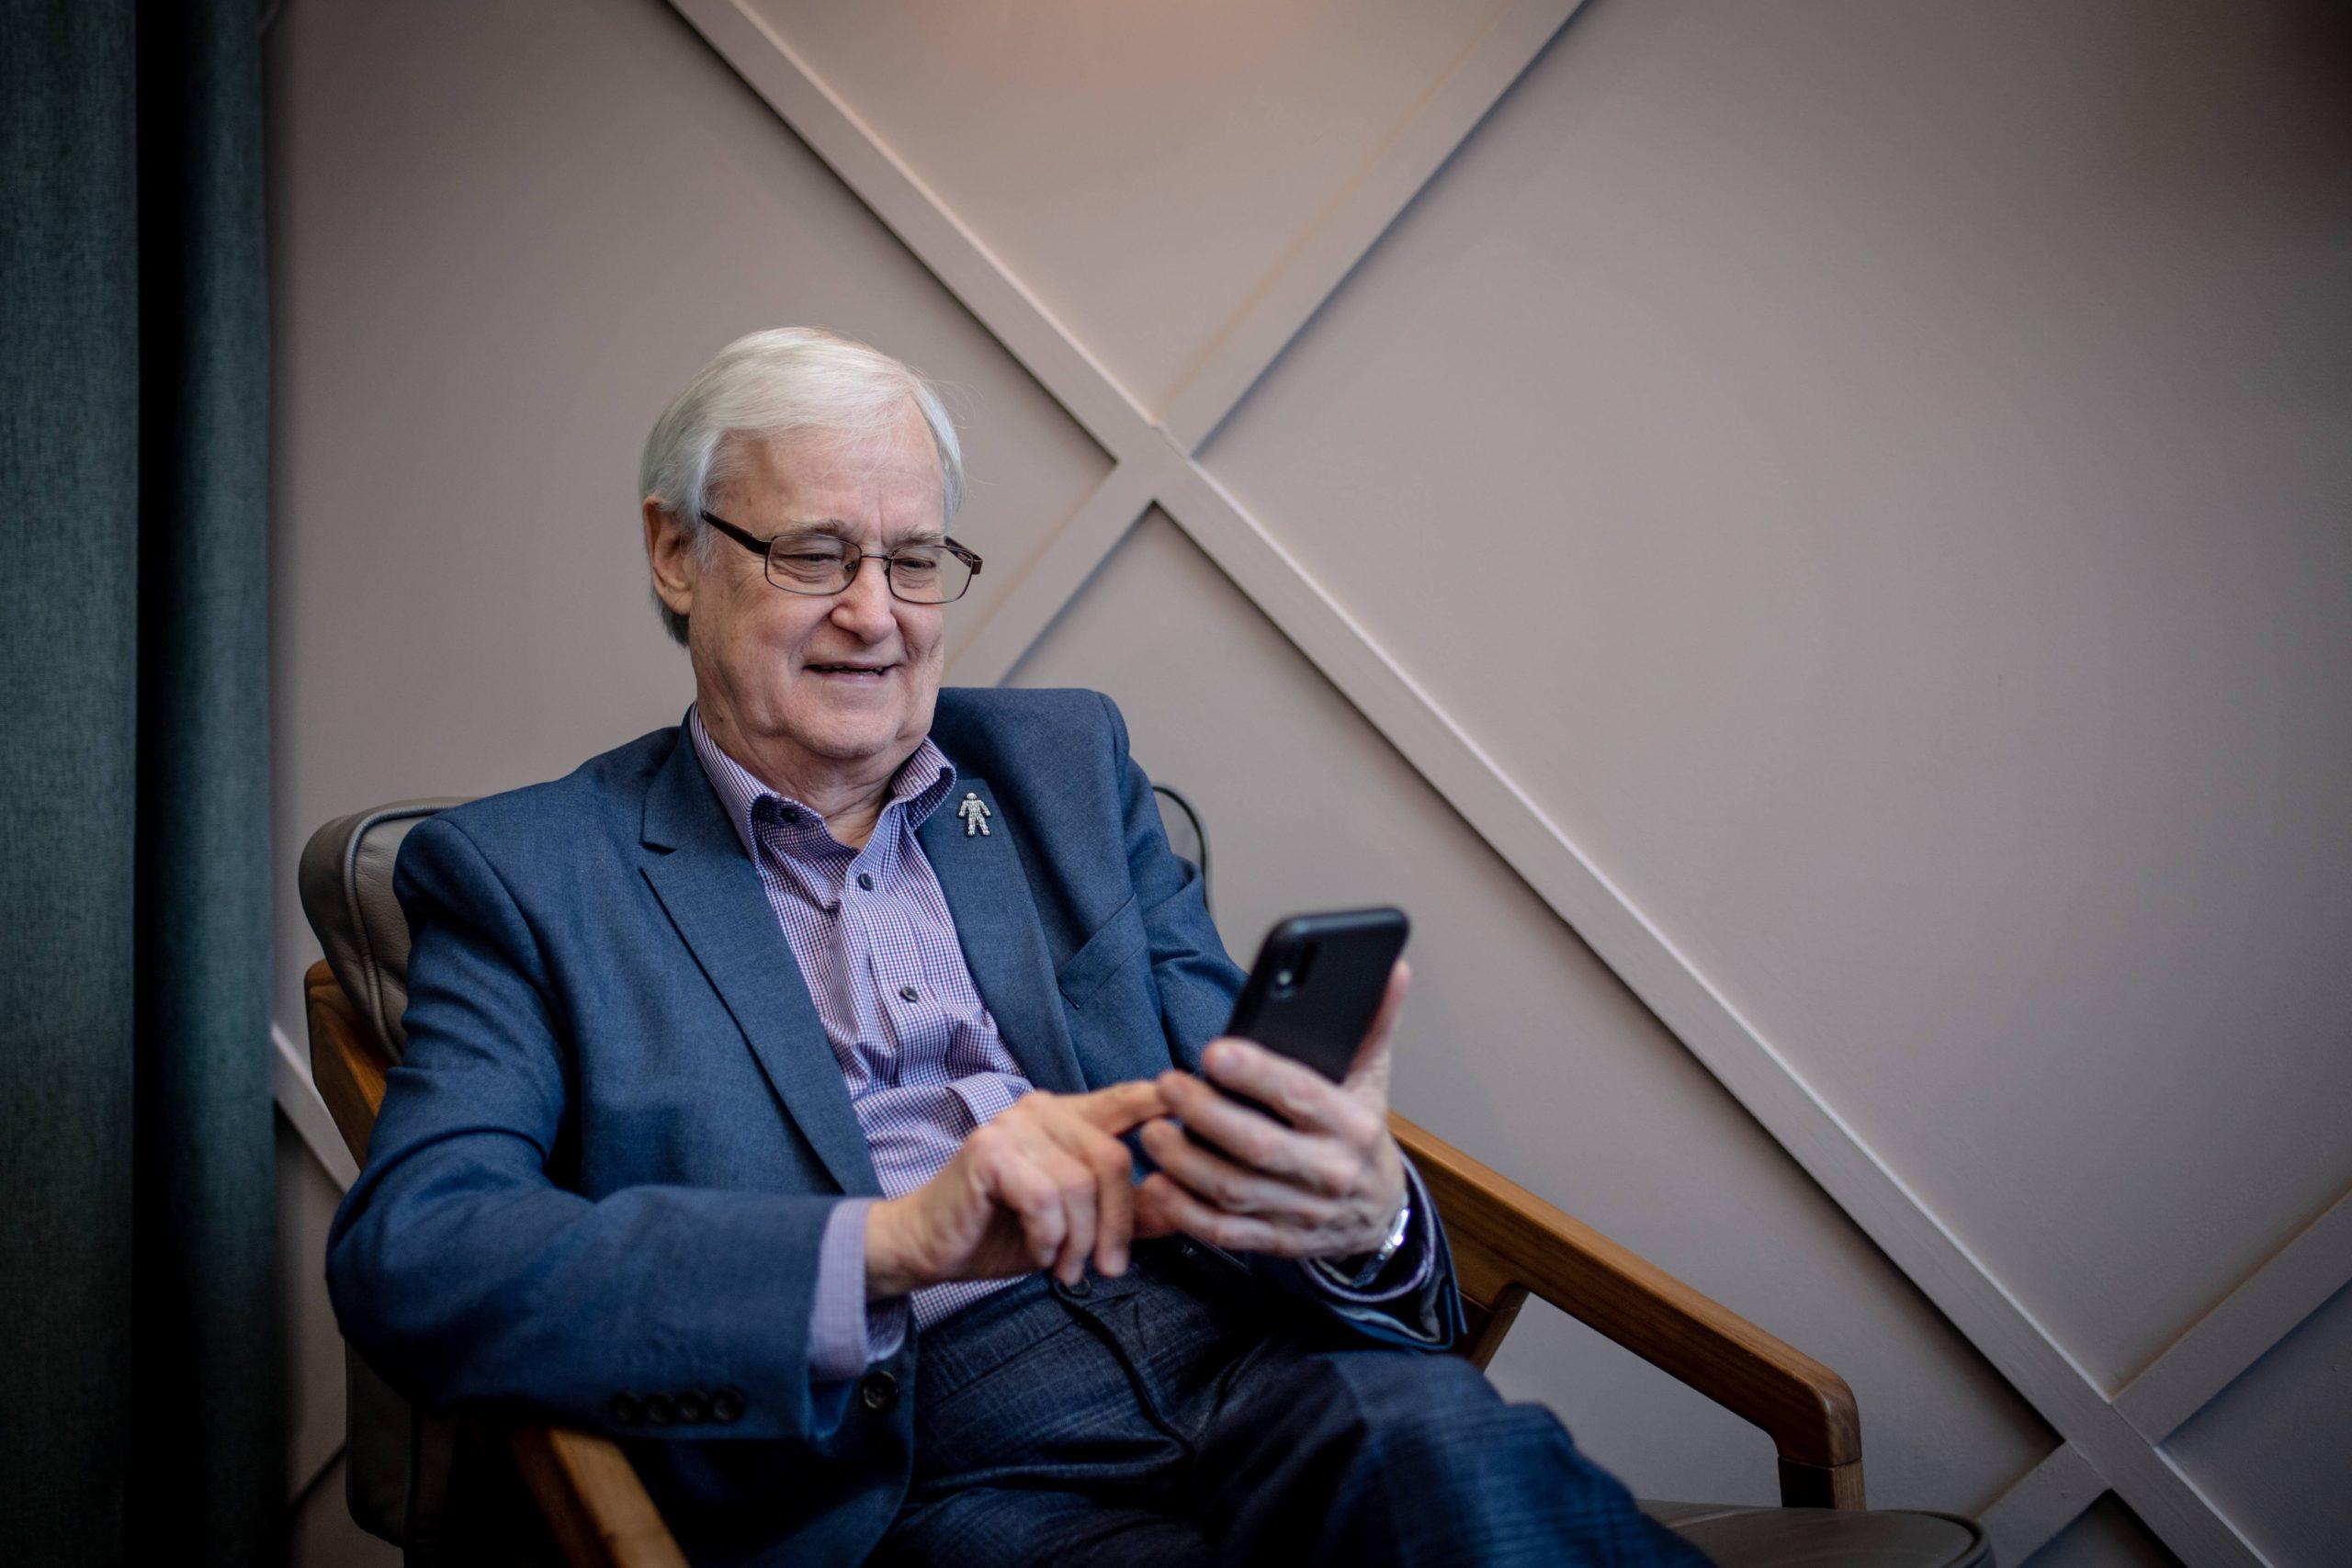 Older man with prostate cancer badge on a smartphone